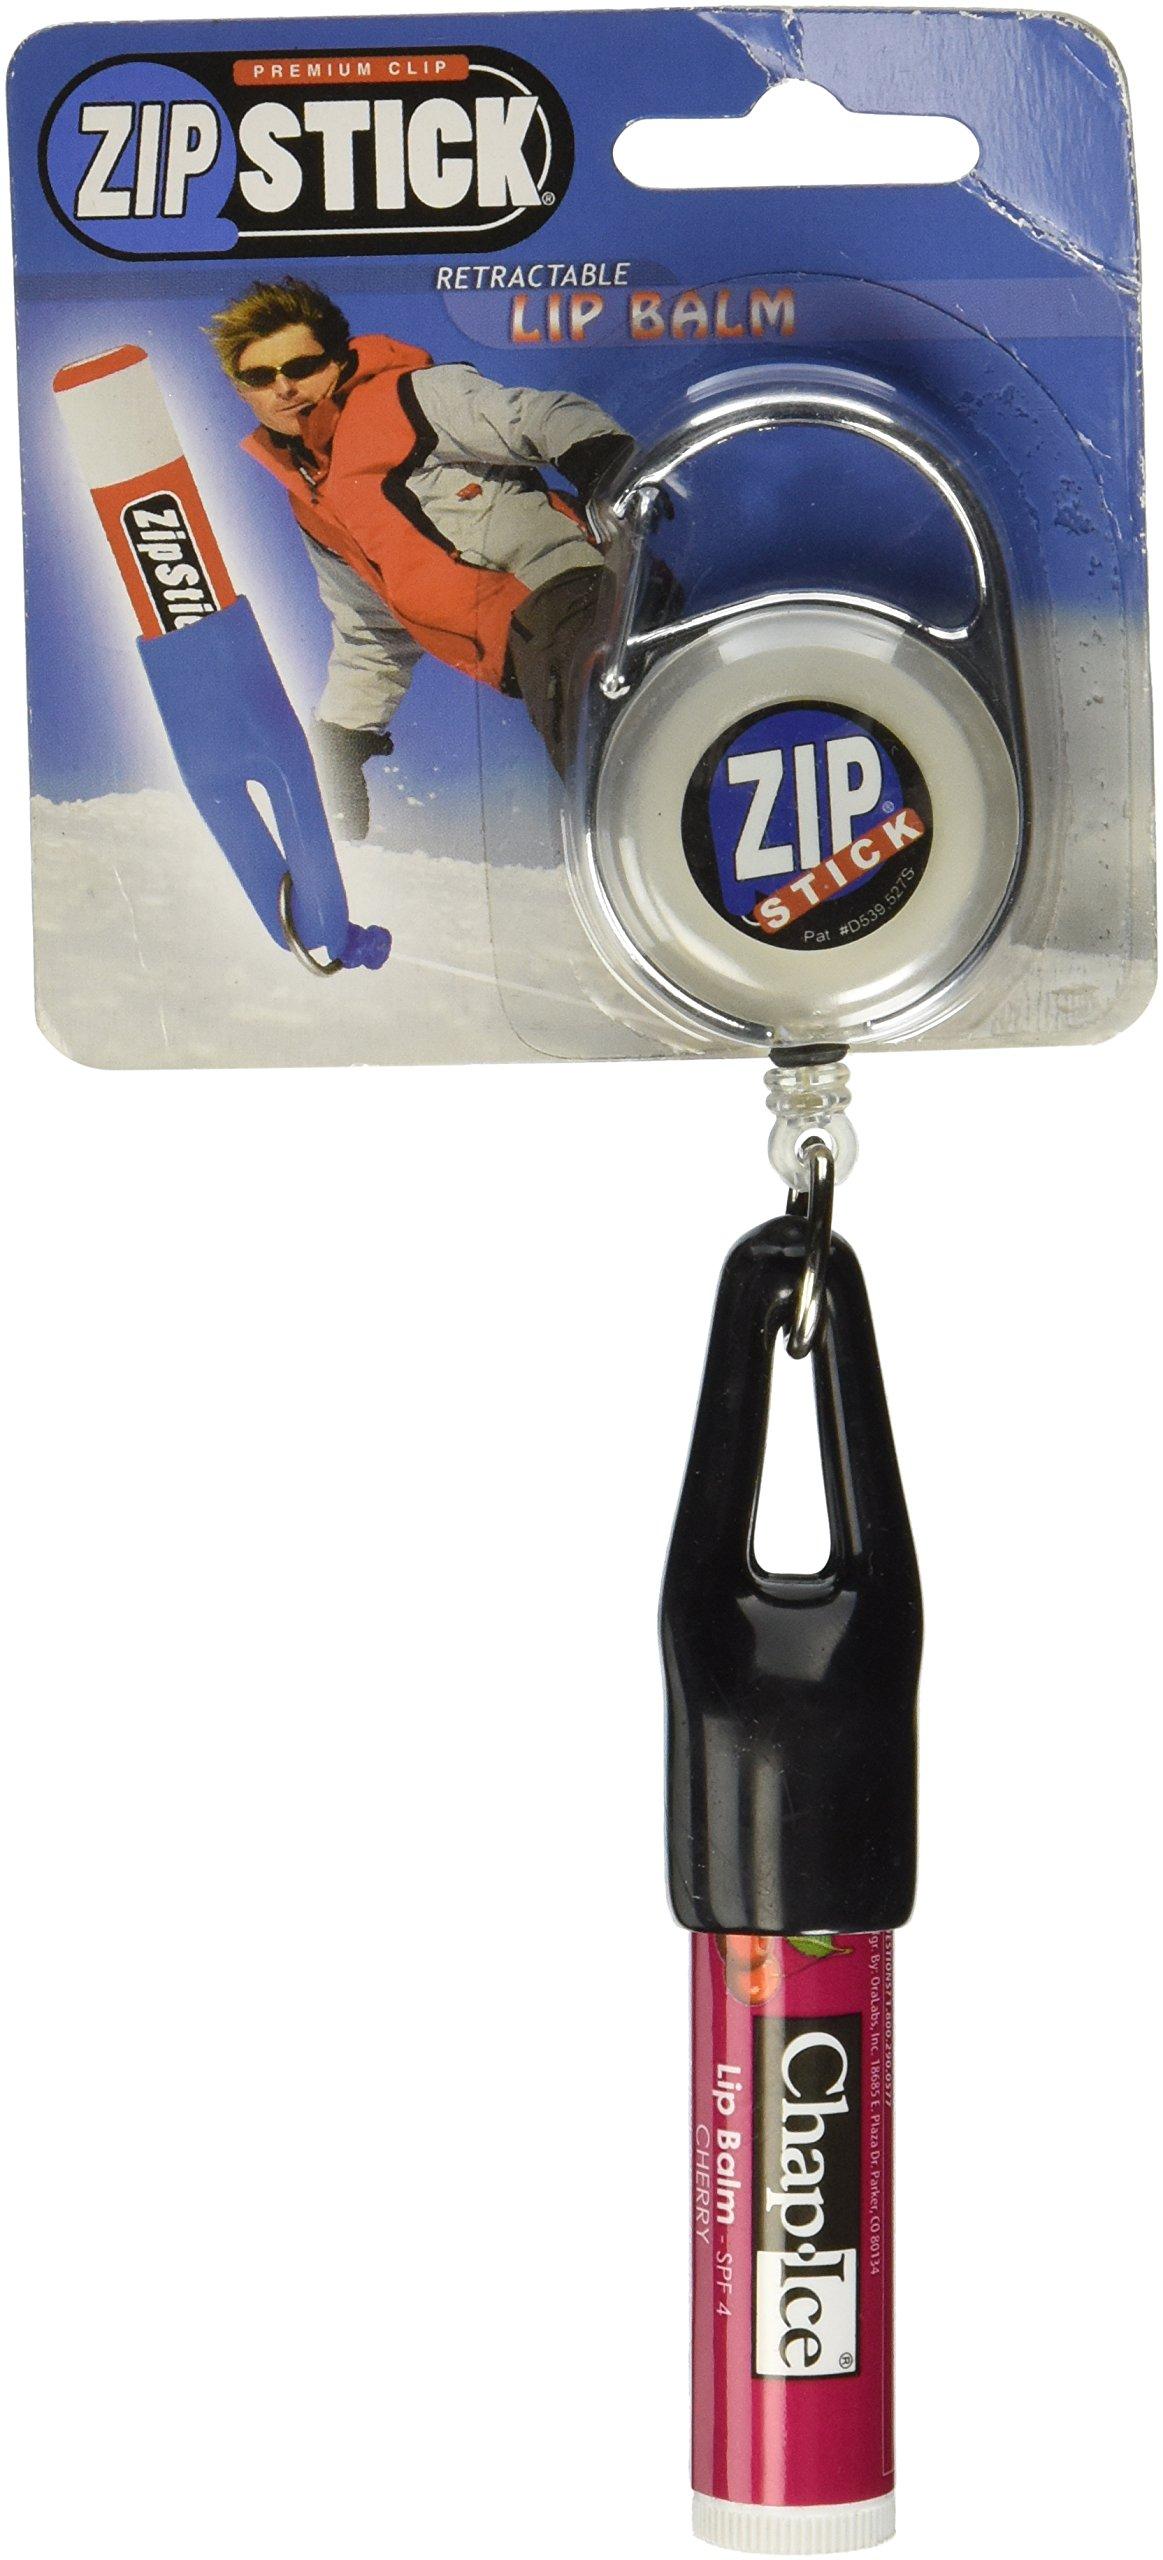 Zip Stick Retractable Lip Balm Holder - 2 Pack HibiclensВ® Surgical Scrub 16 oz., Case of 12